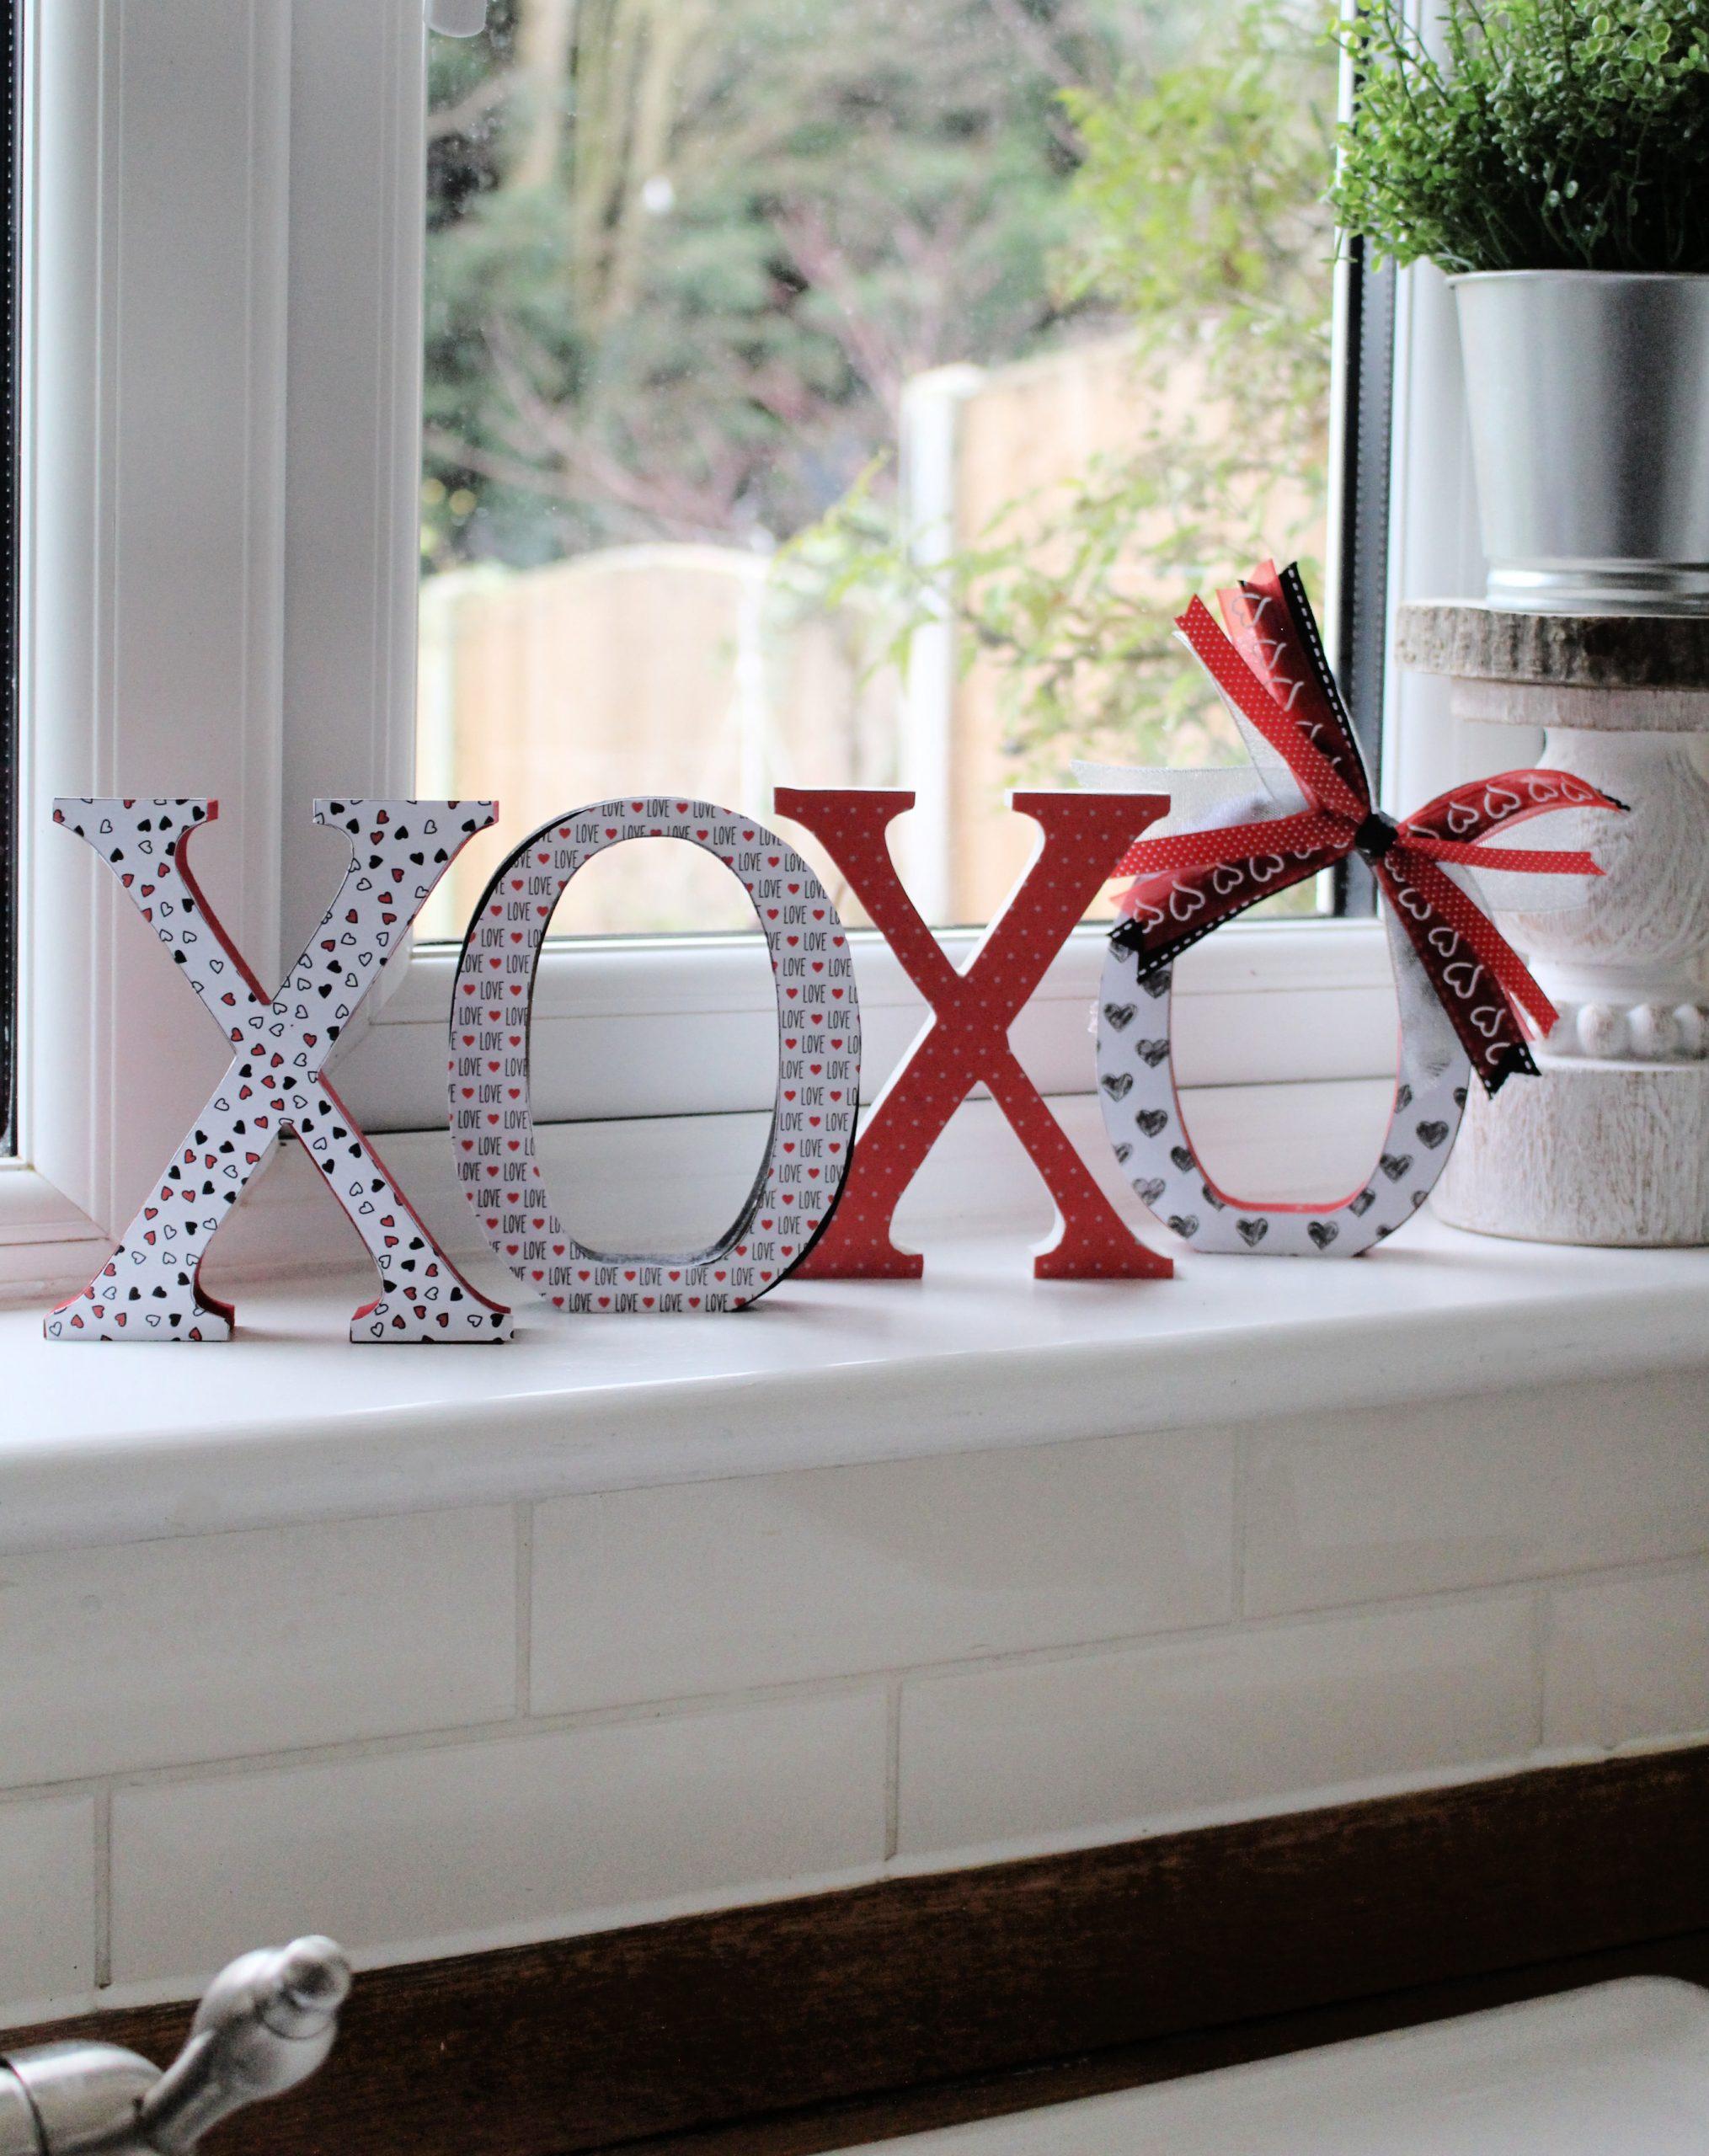 XOXO Valentine Mod Podge project